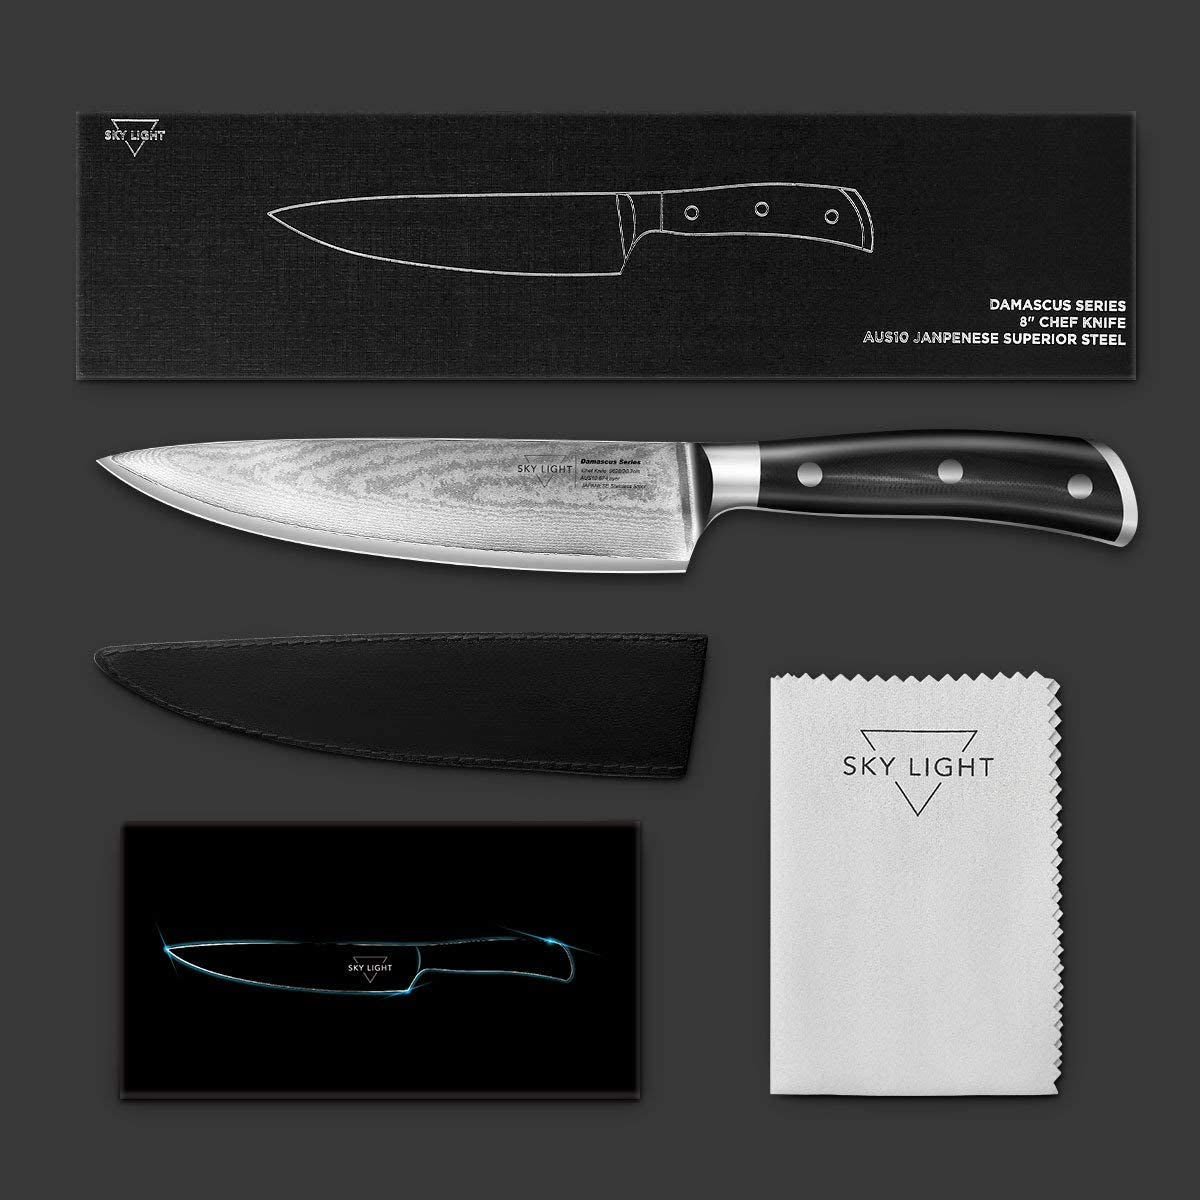 Damascus Santoku Chef Knife, Damascus Santoku Knife 67-layer Handmade 7-inch, Full Japanese AUS10V High Carbon Stainless Steel w/Sheath/Gift Box Included Damasucs Chef Knife